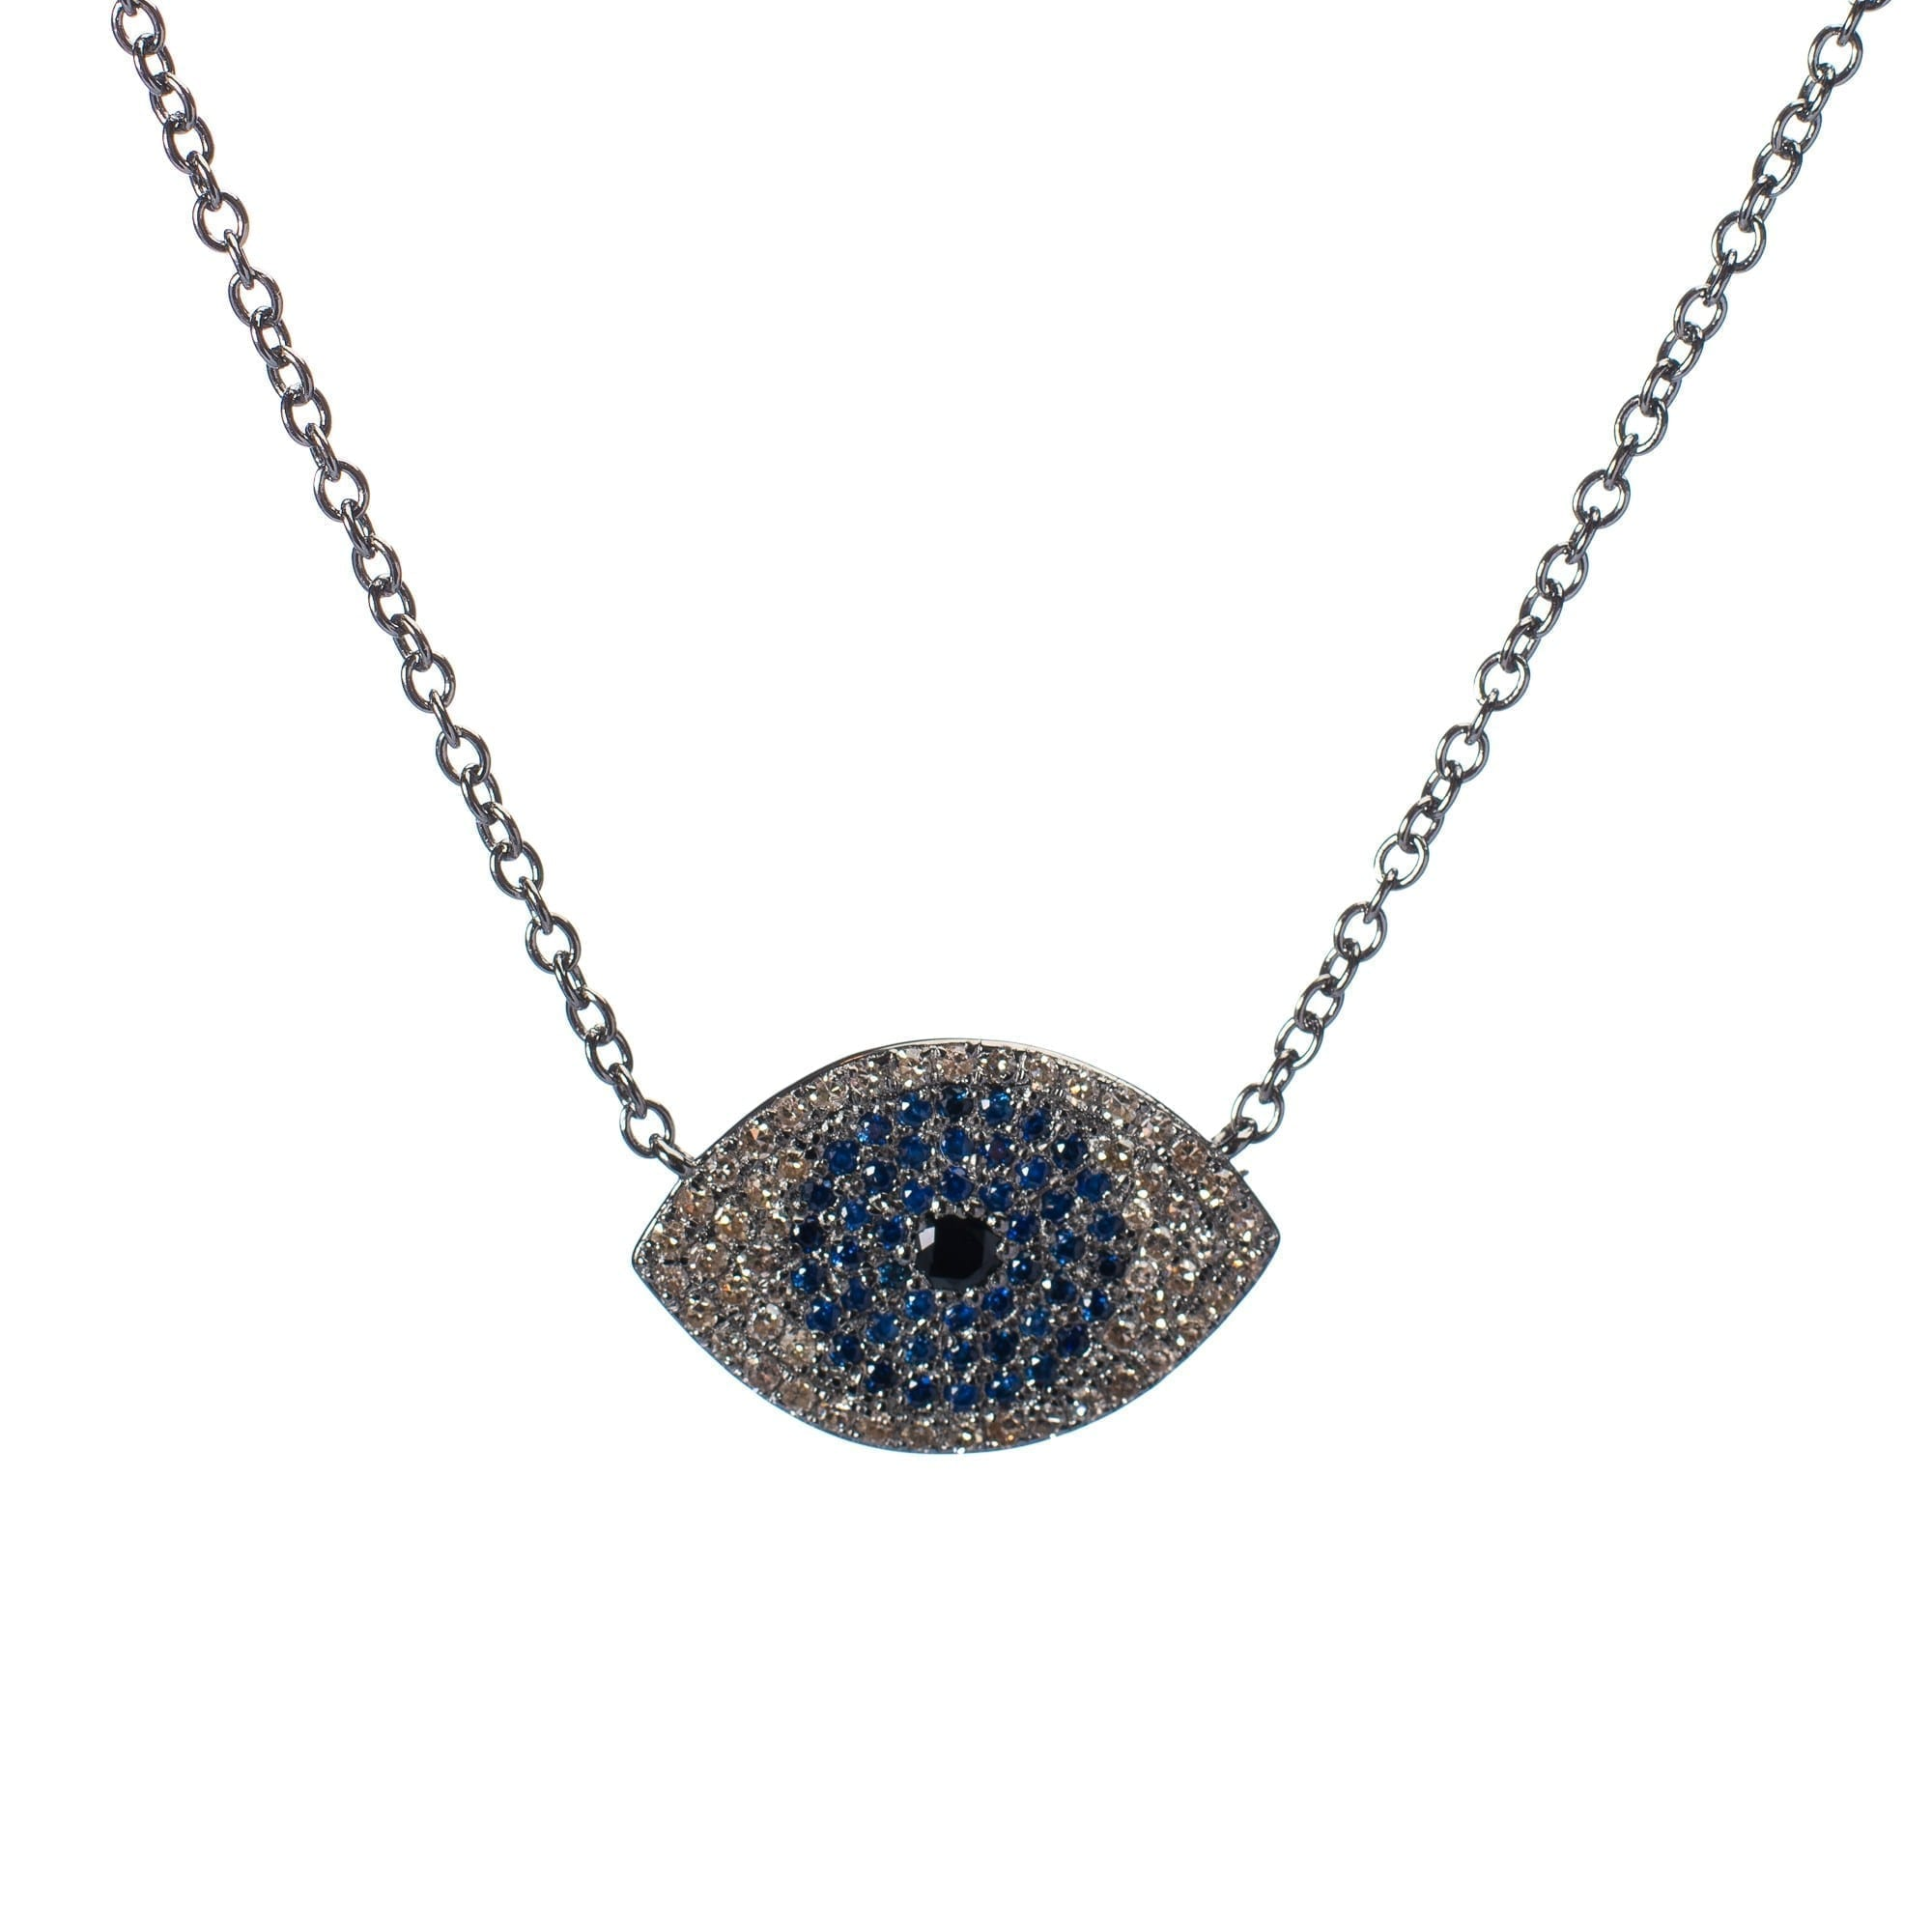 Pave Diamond Evil Eye with Sapphires